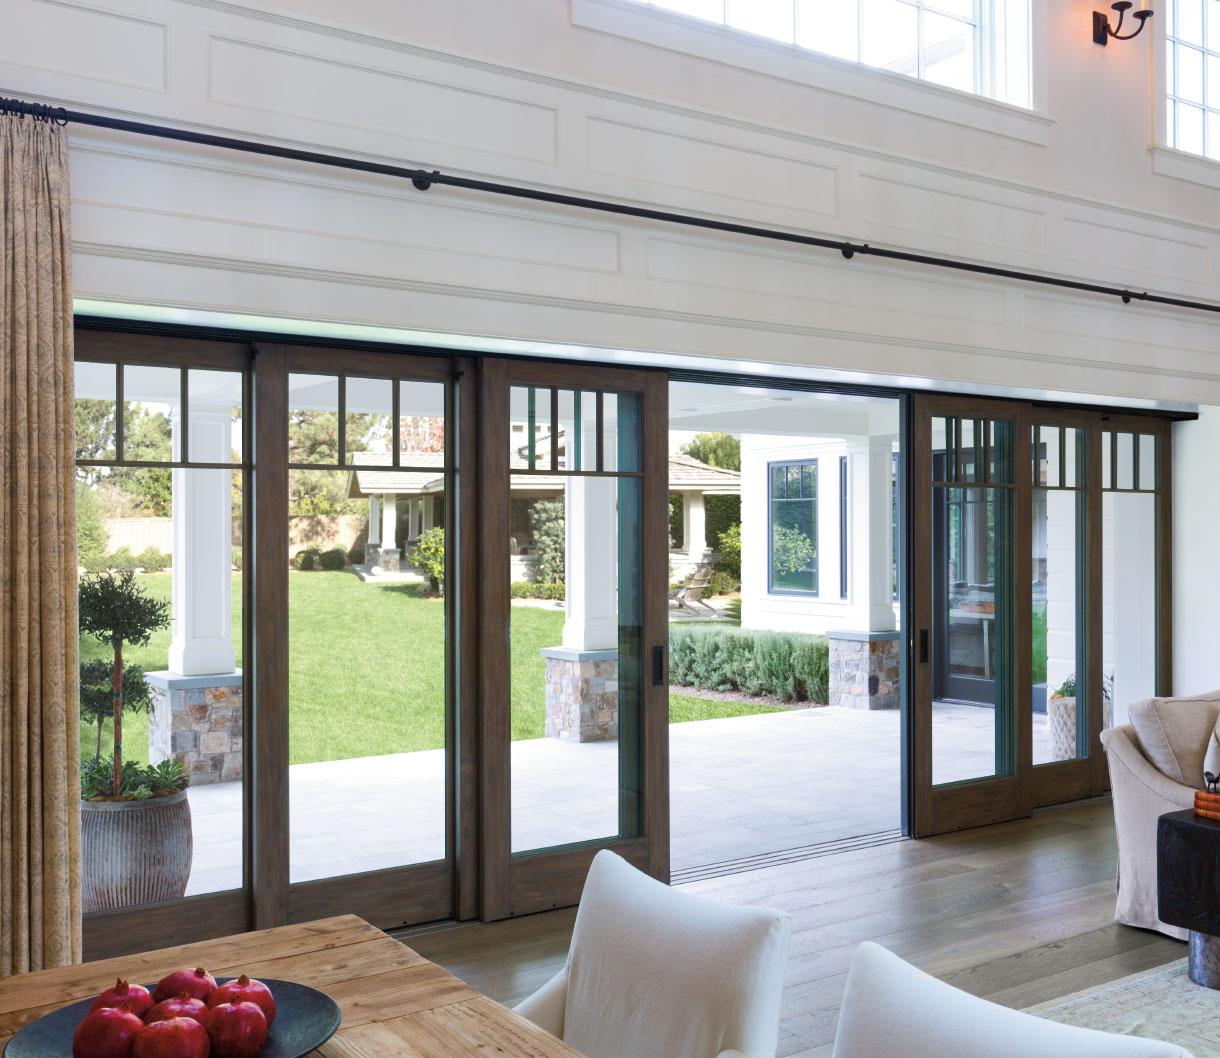 pella architect series traditional multi slide patio door